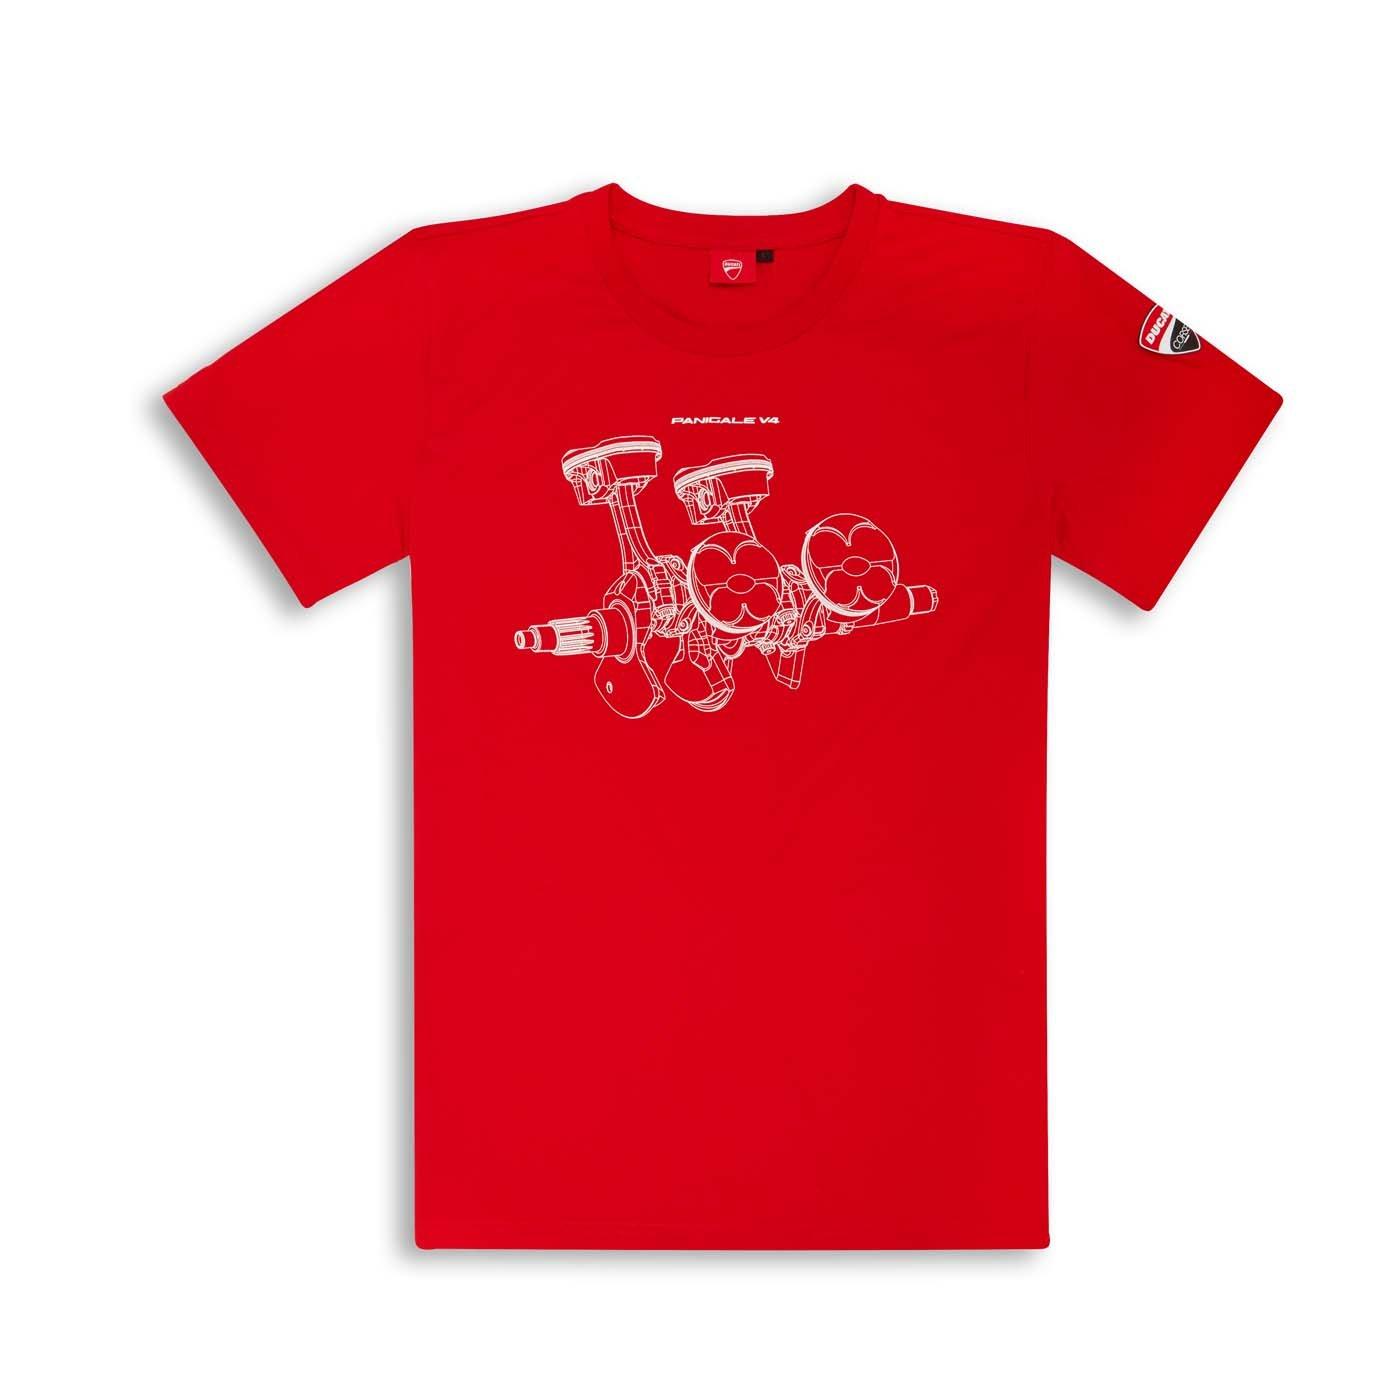 Ducati V4 Panigale T-Shirt